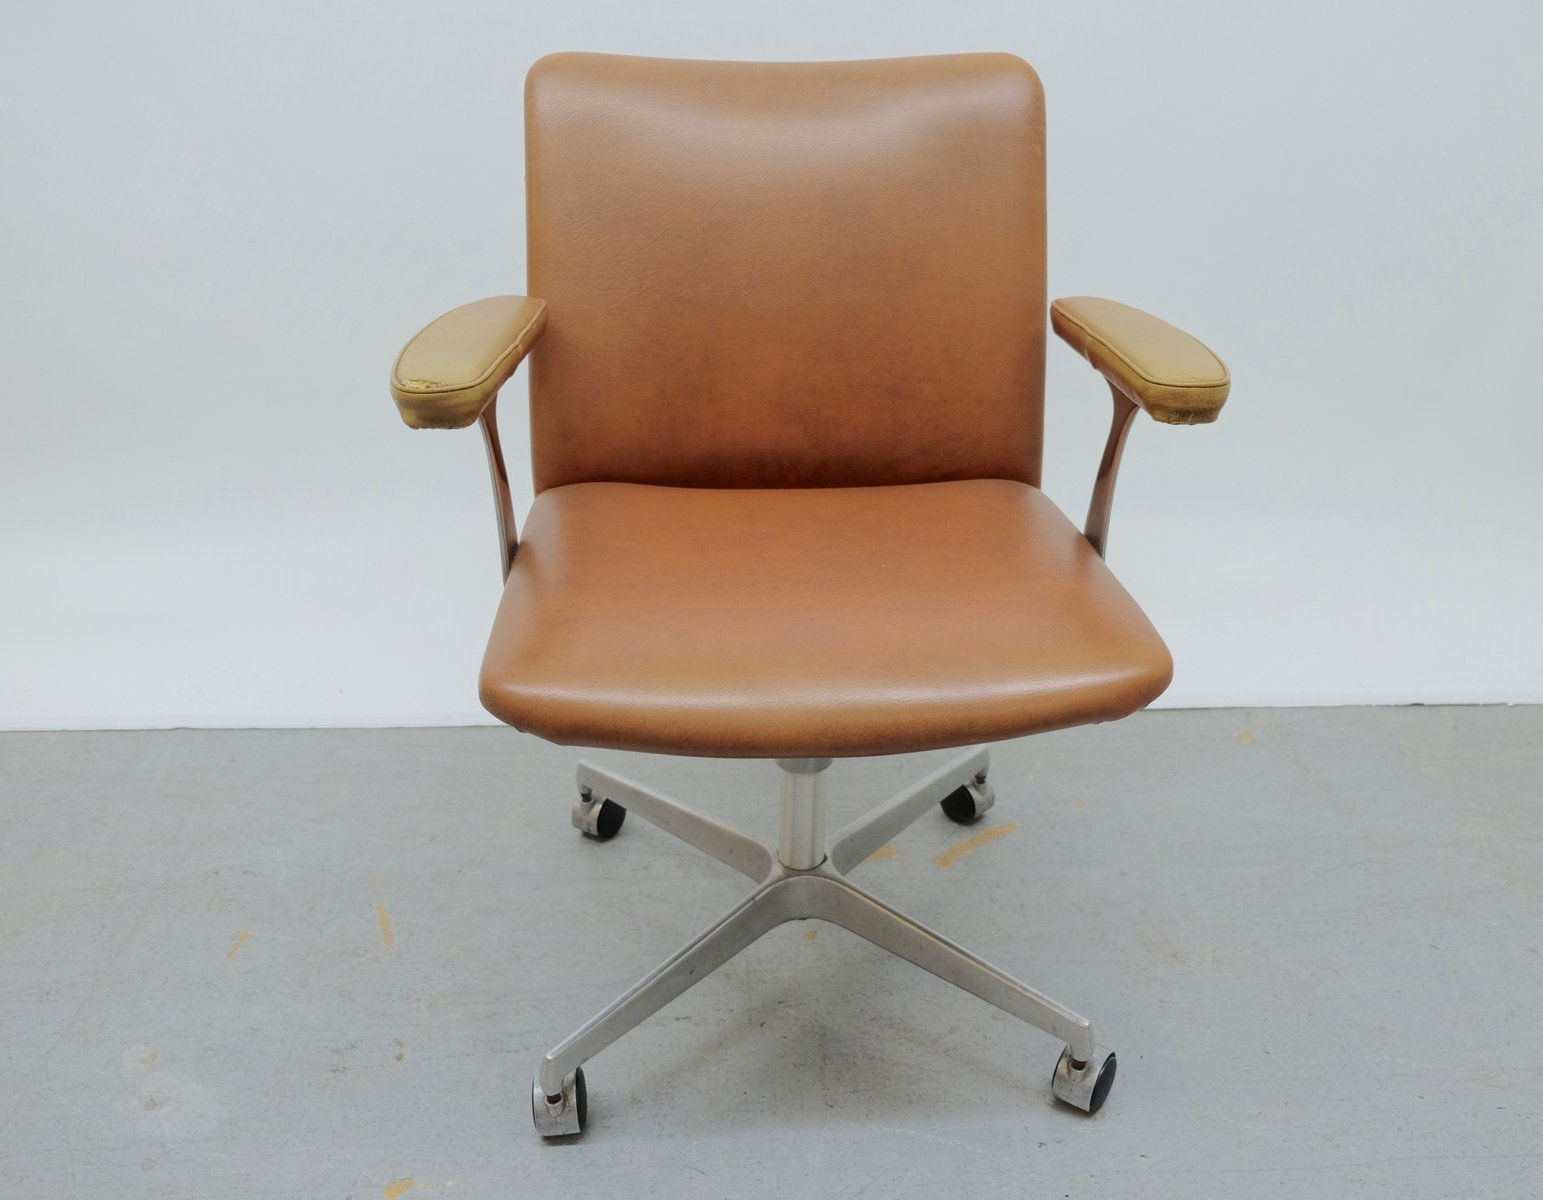 Vintage Desk Chair By Finn Juhl For France U0026 Son